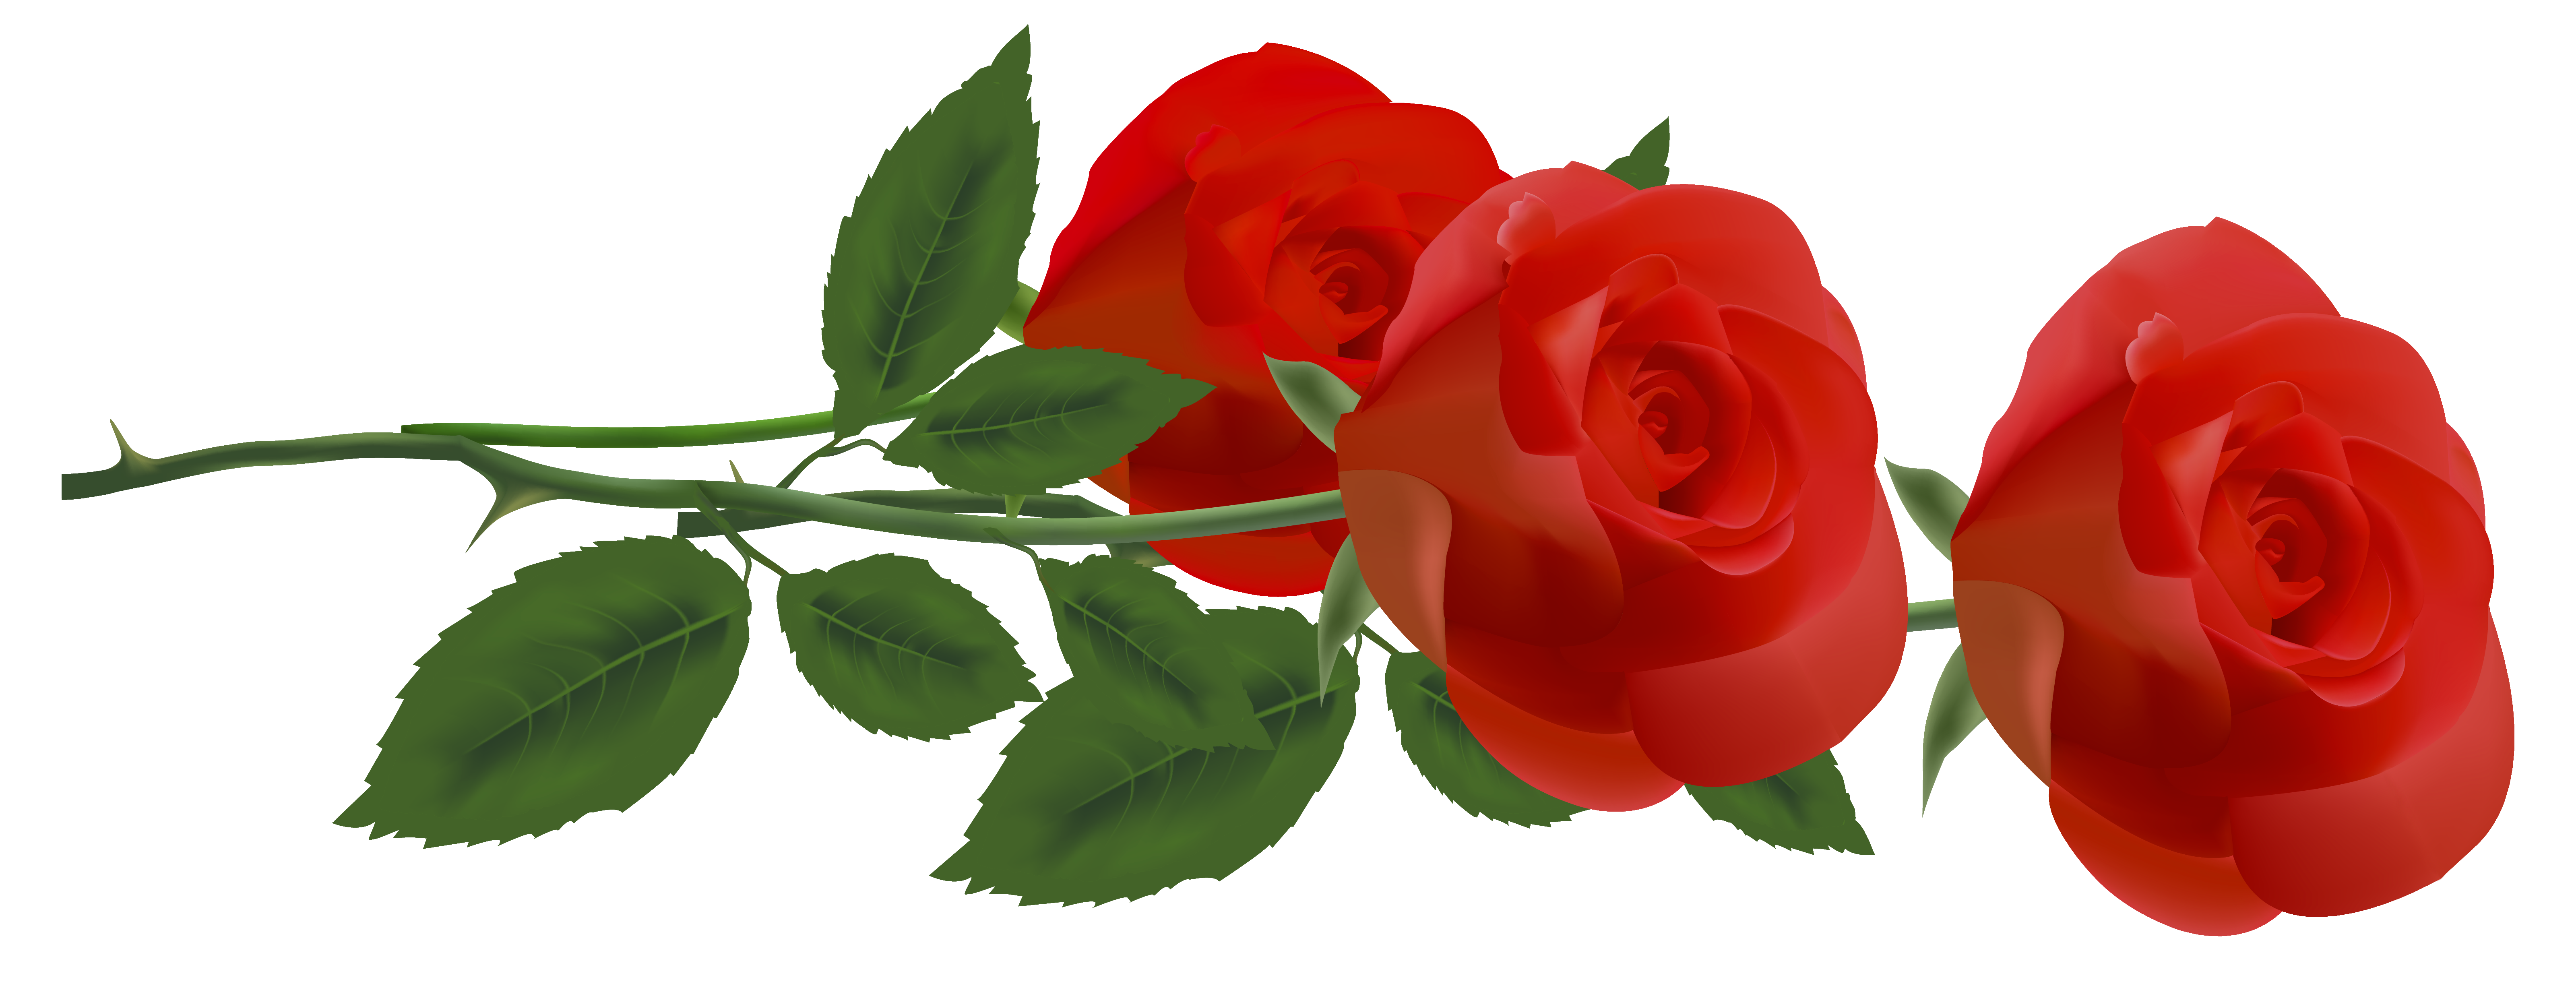 Rose Flower Clipart Free Download Best Rose Flower Clipart On